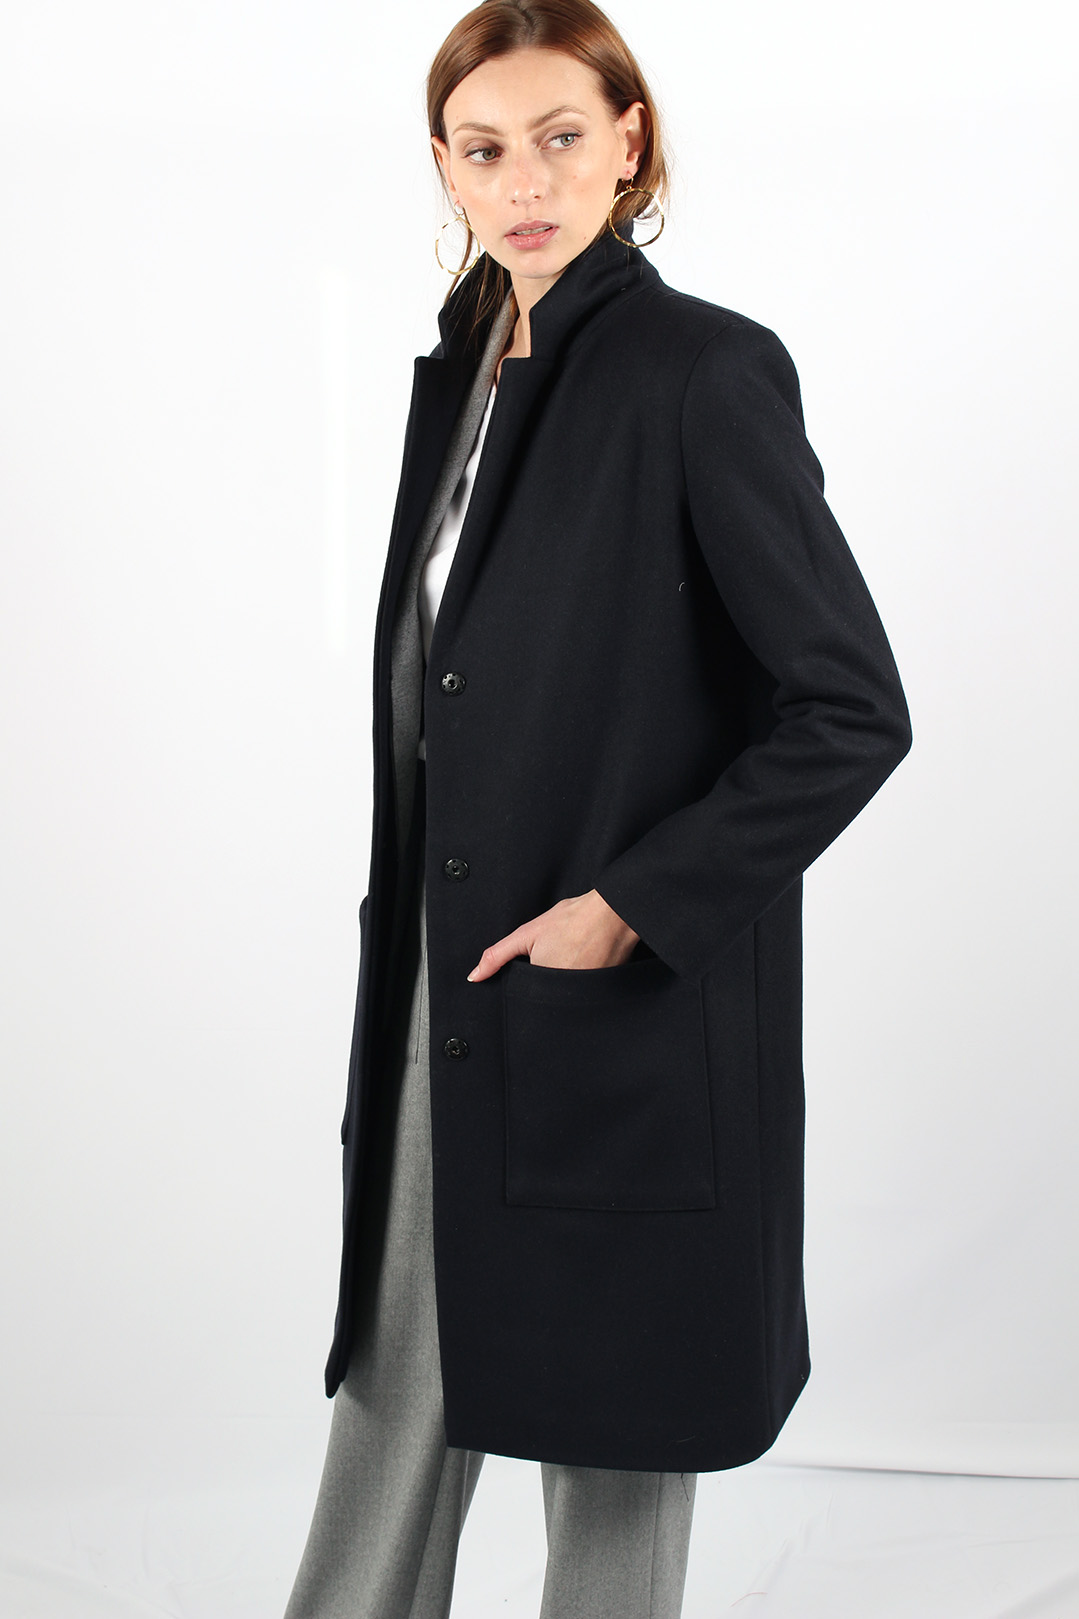 manteau droit femme bleu marine14